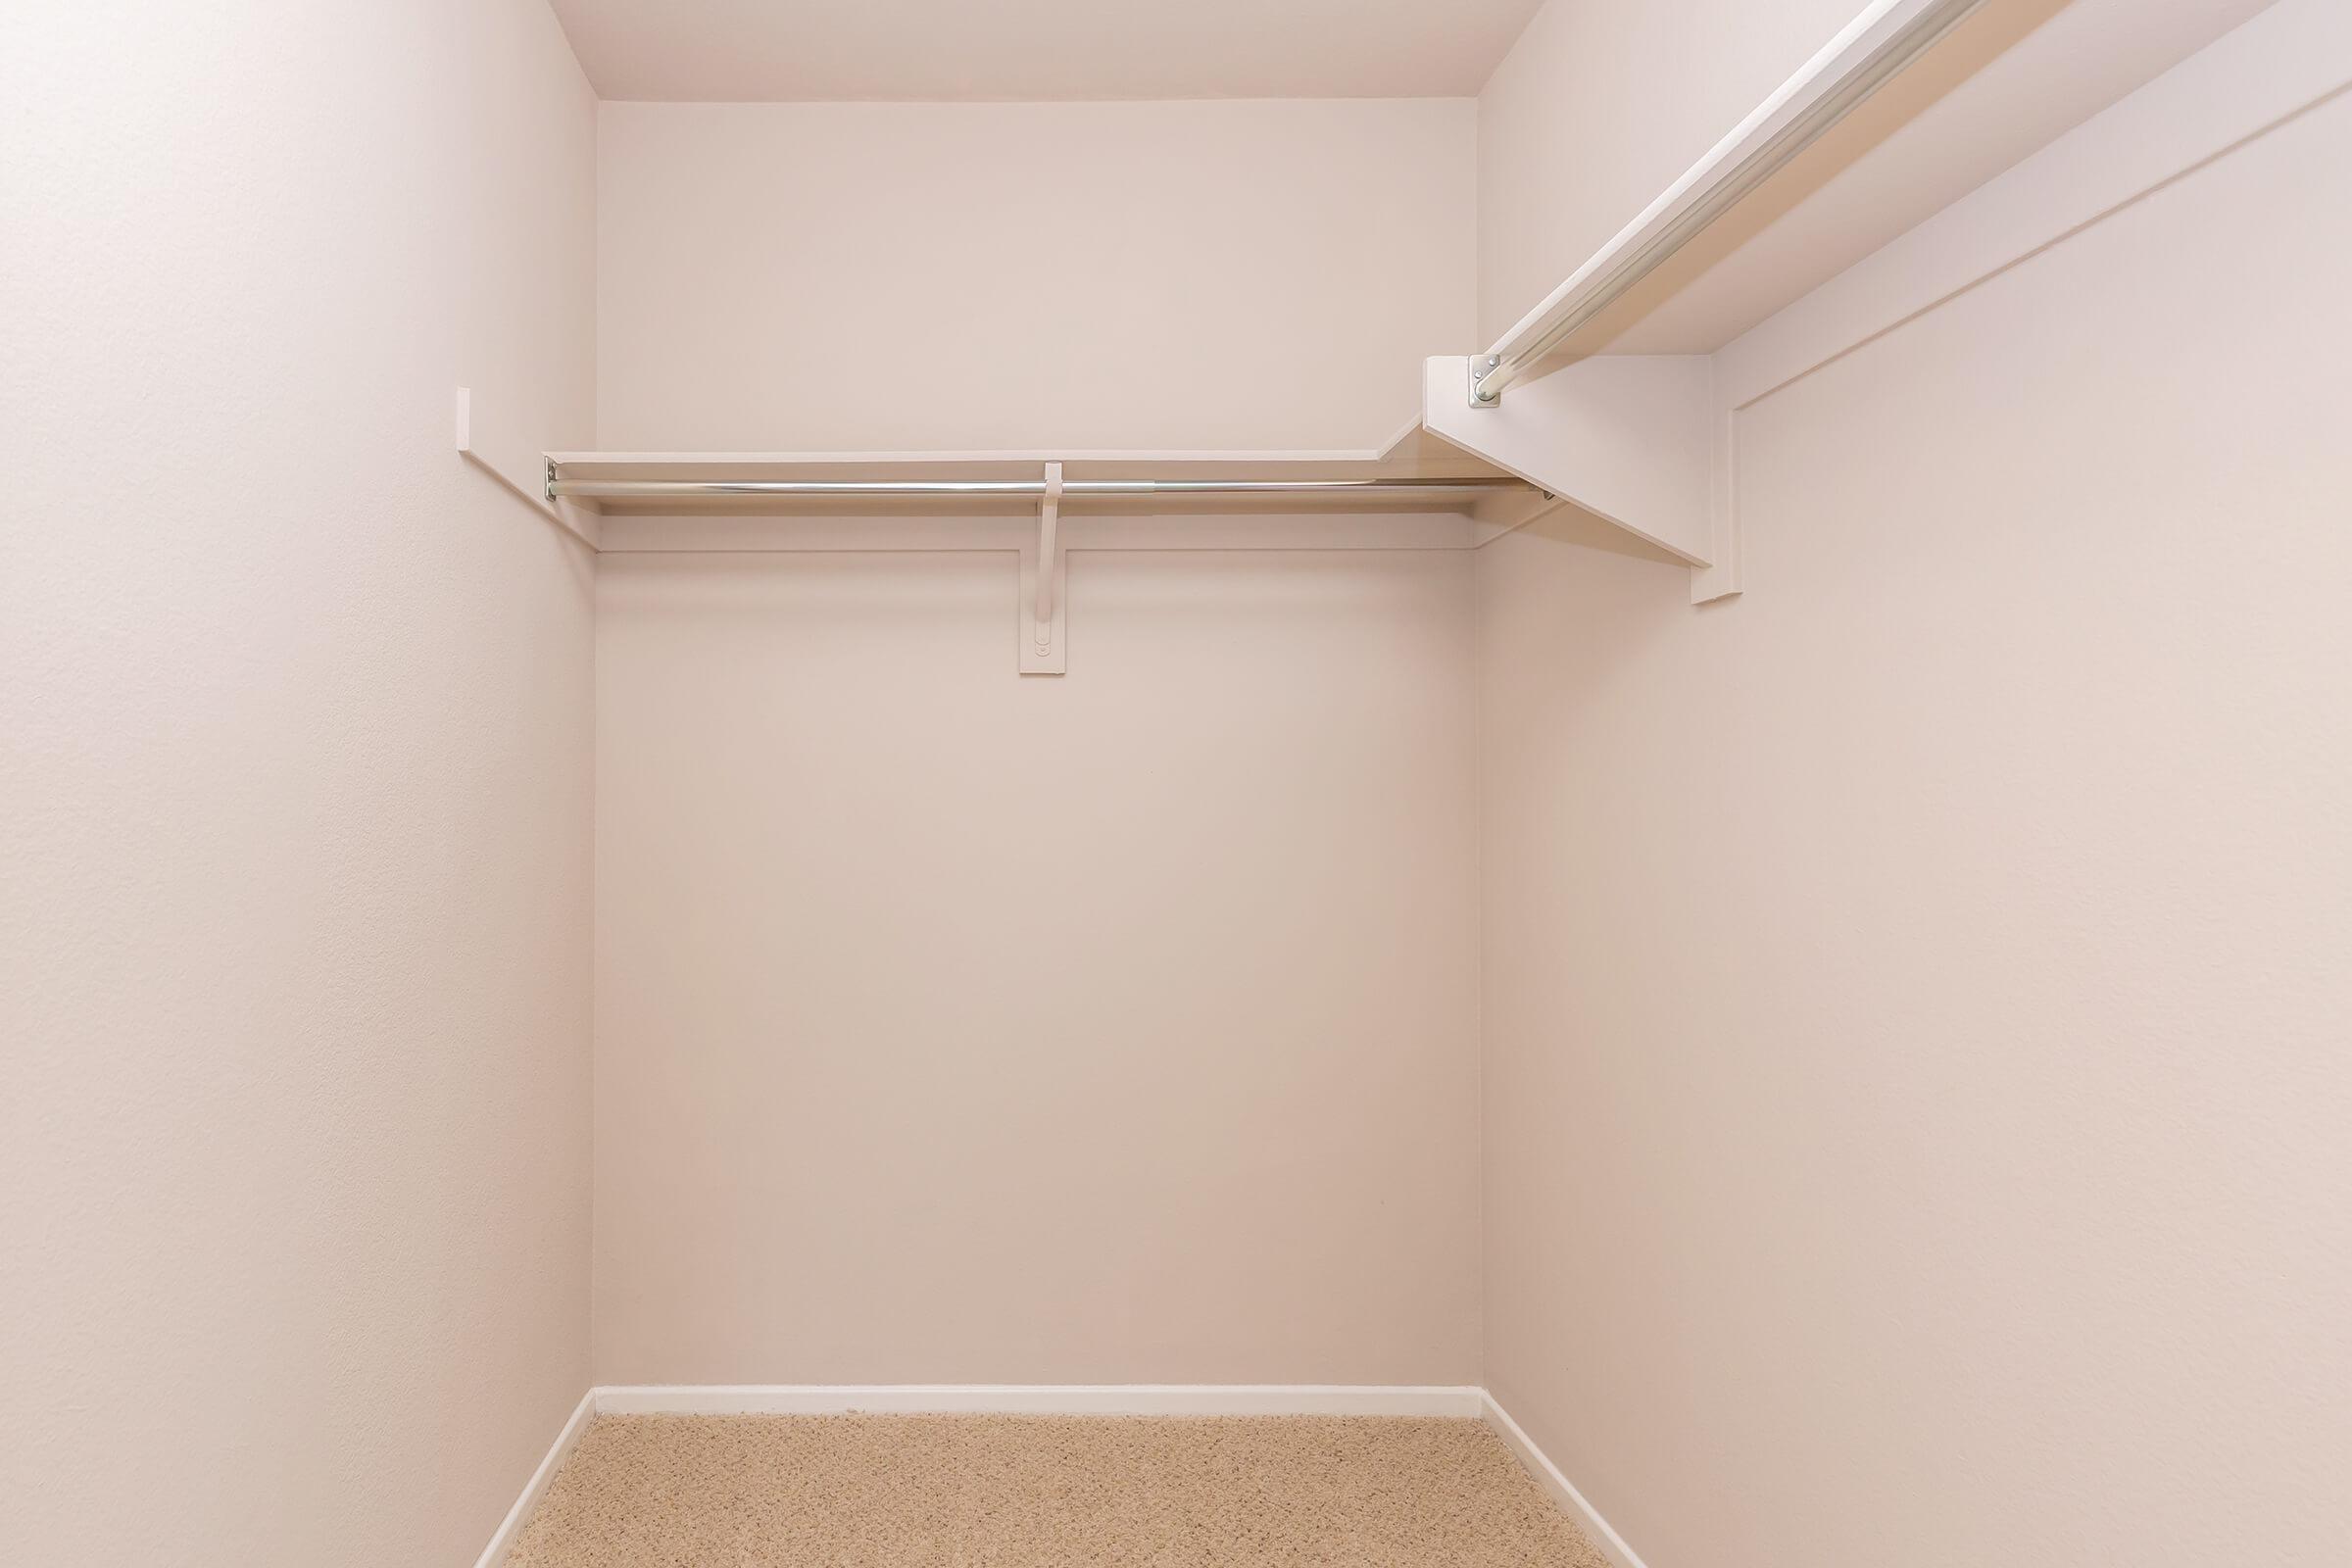 Walk-in closet with carpet